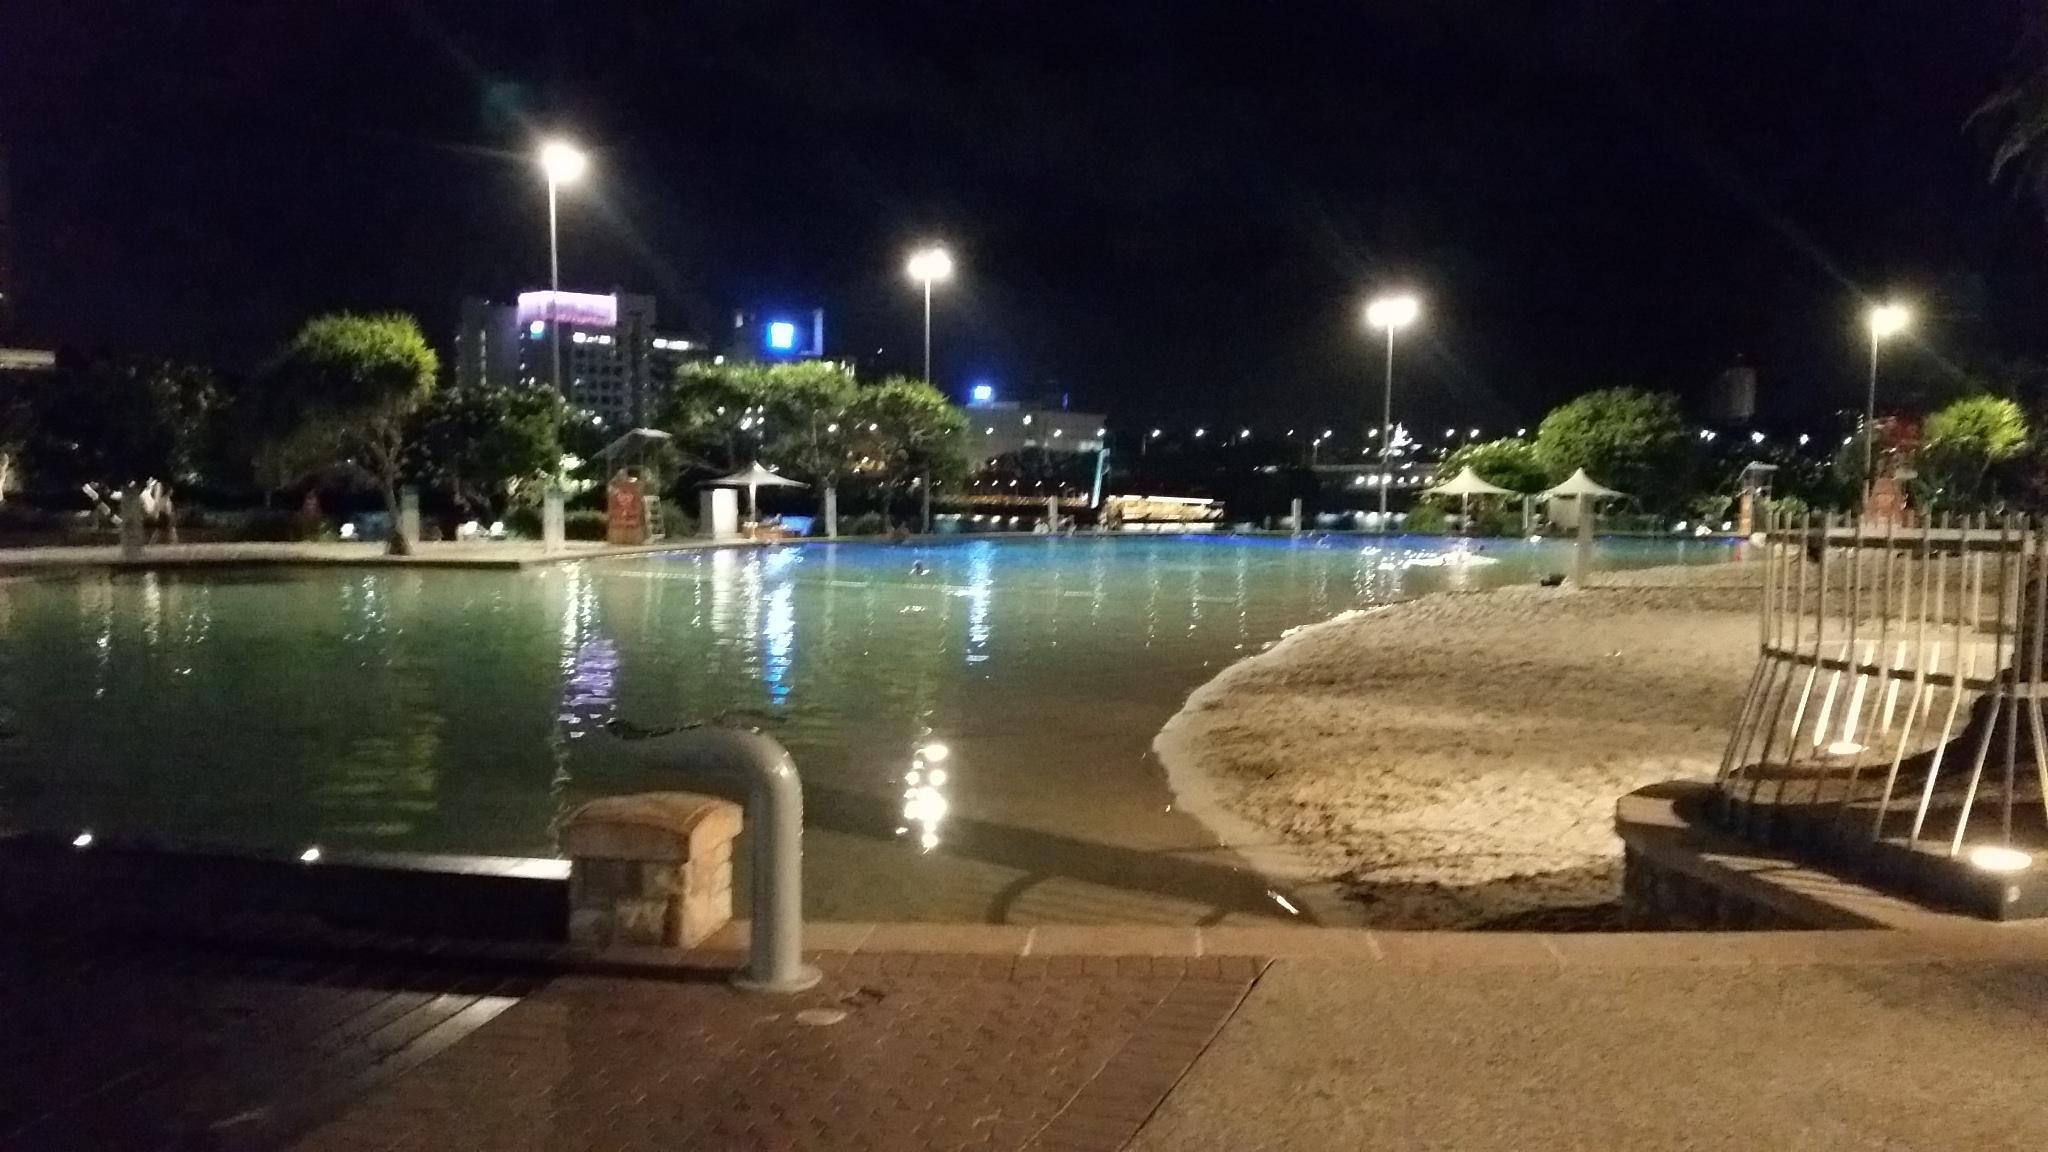 Southbank for evening swim